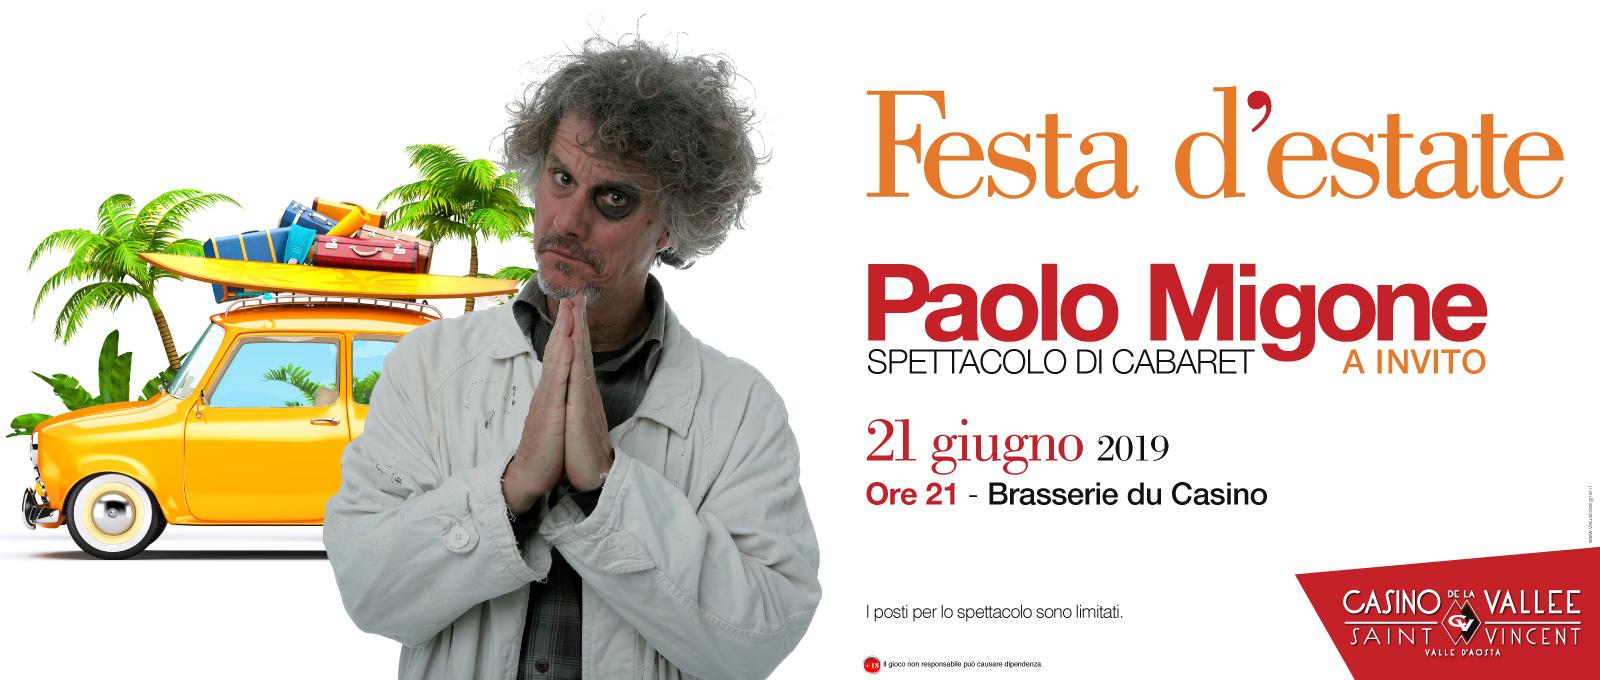 Festa d'estate – Paolo Migone